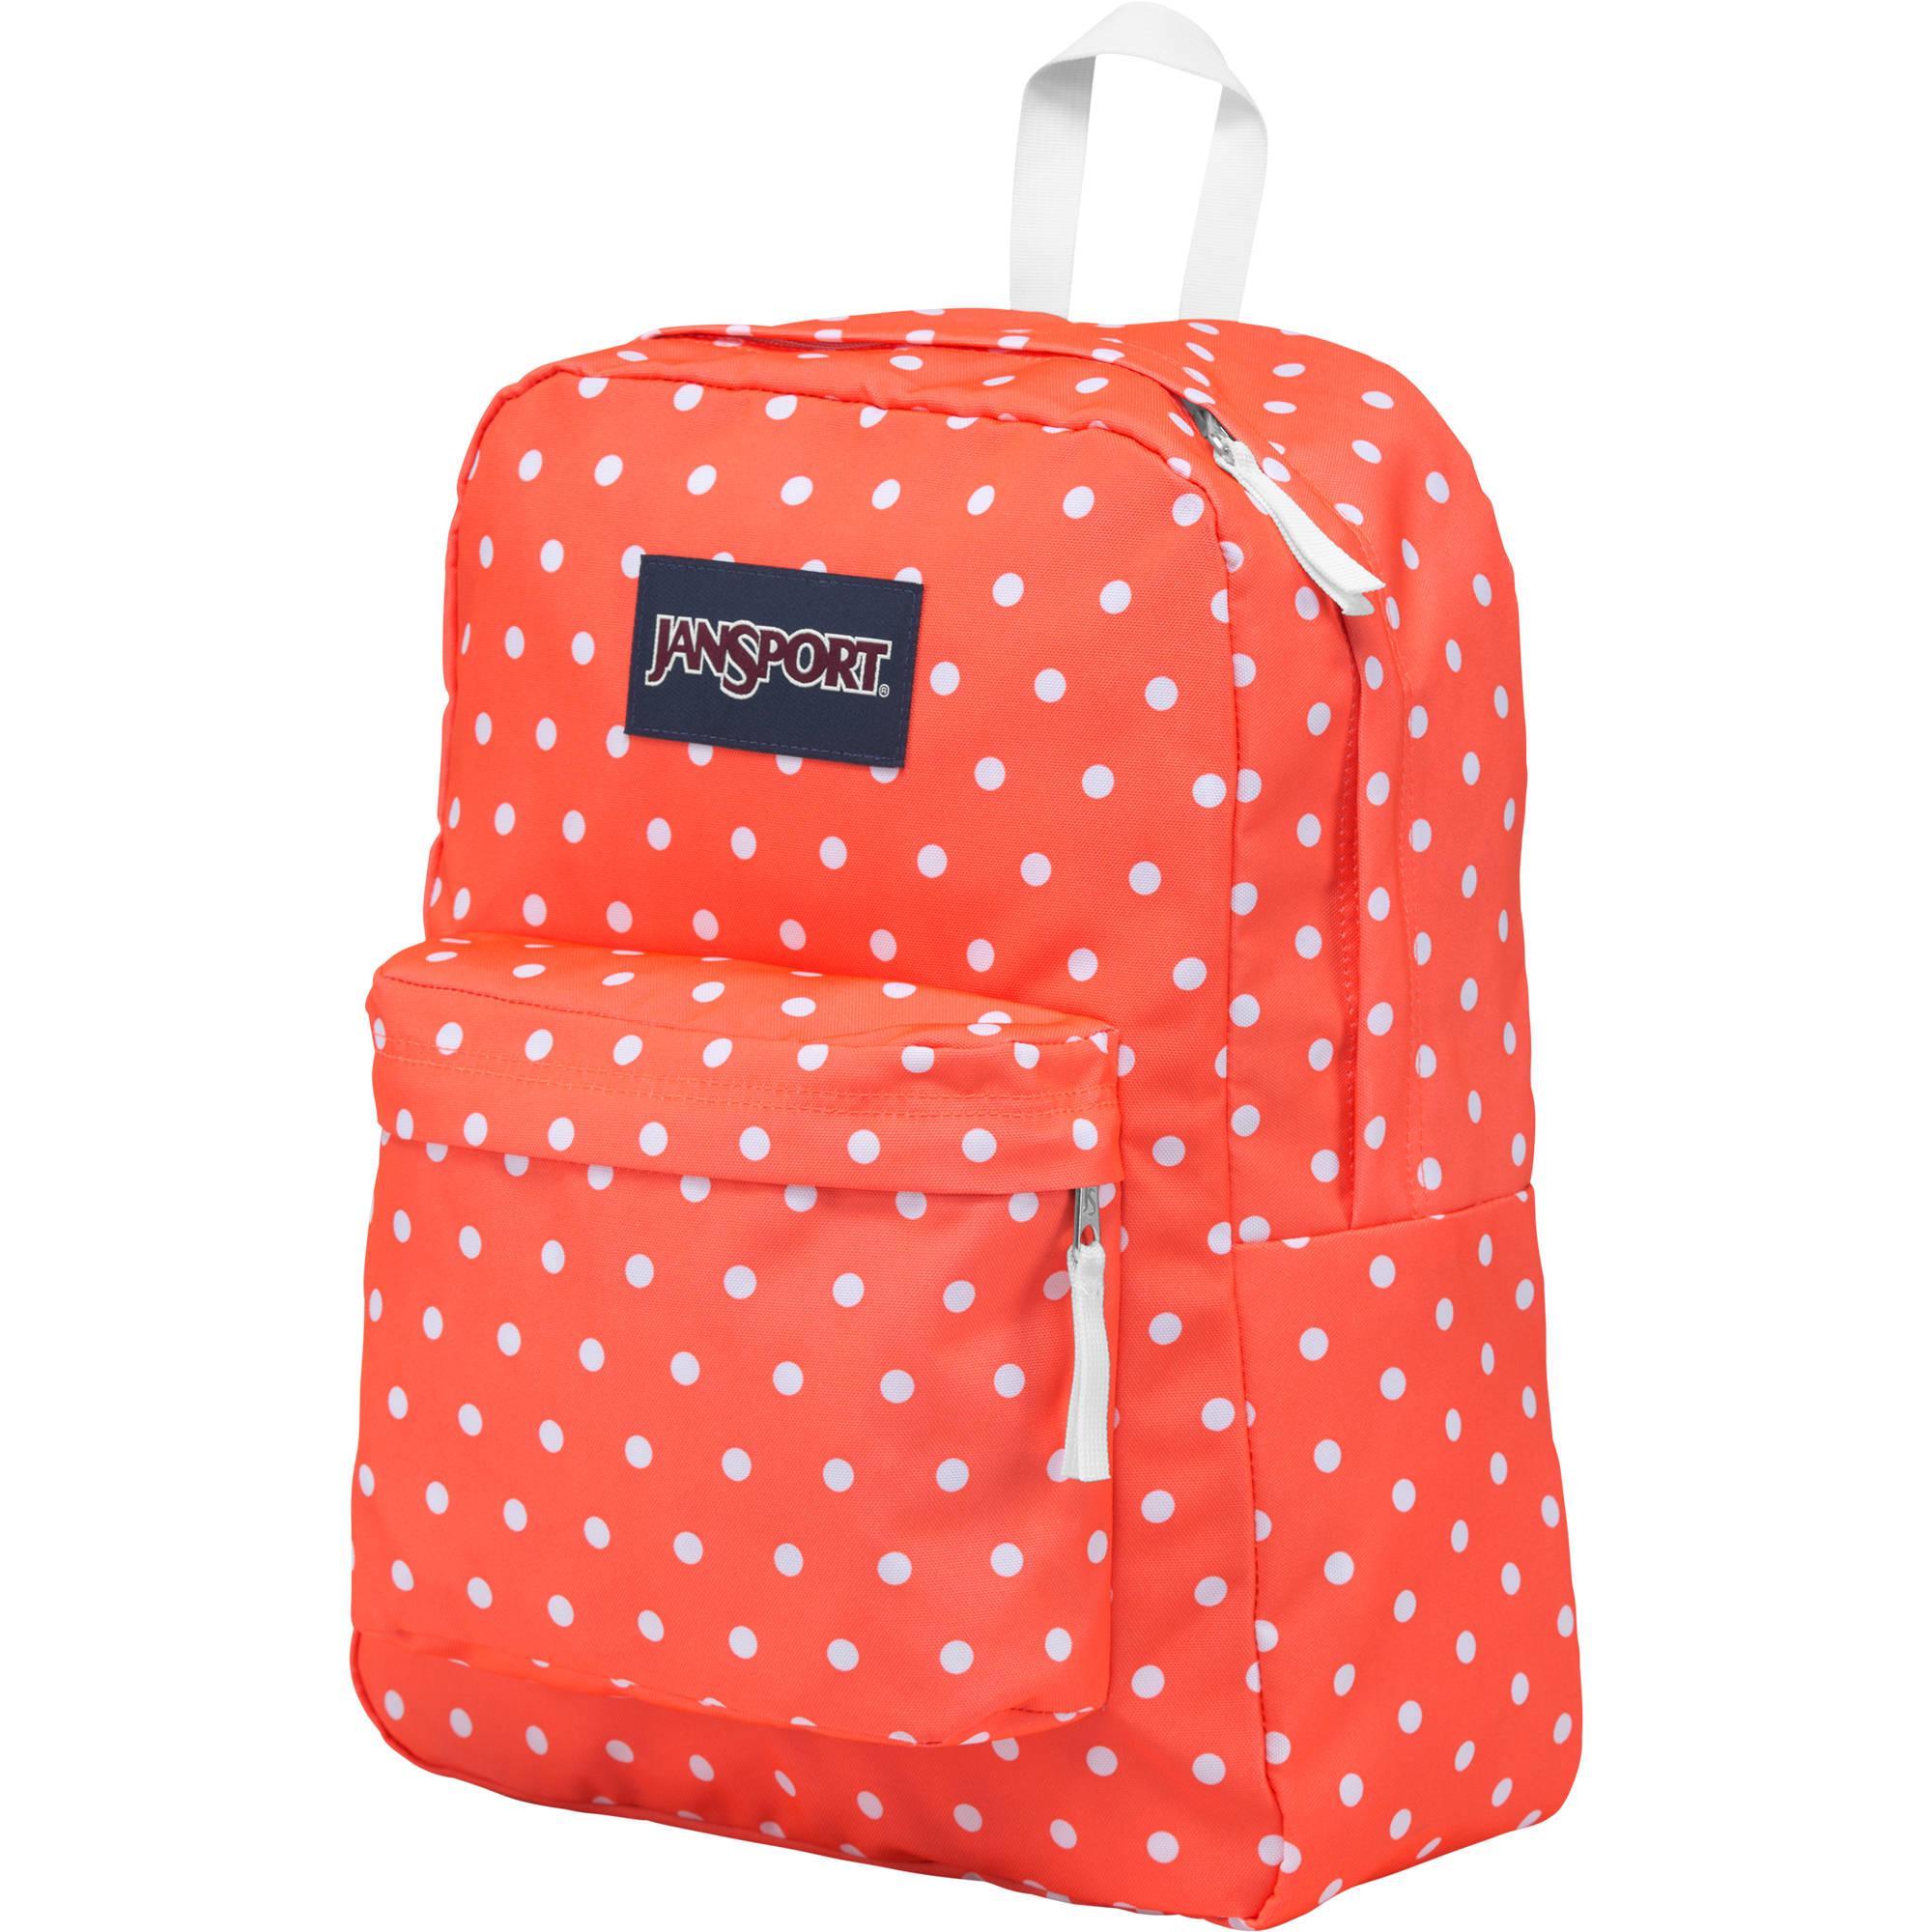 67e14d8344 JanSport SuperBreak 25L Backpack (Tahitian Orange White Dots)